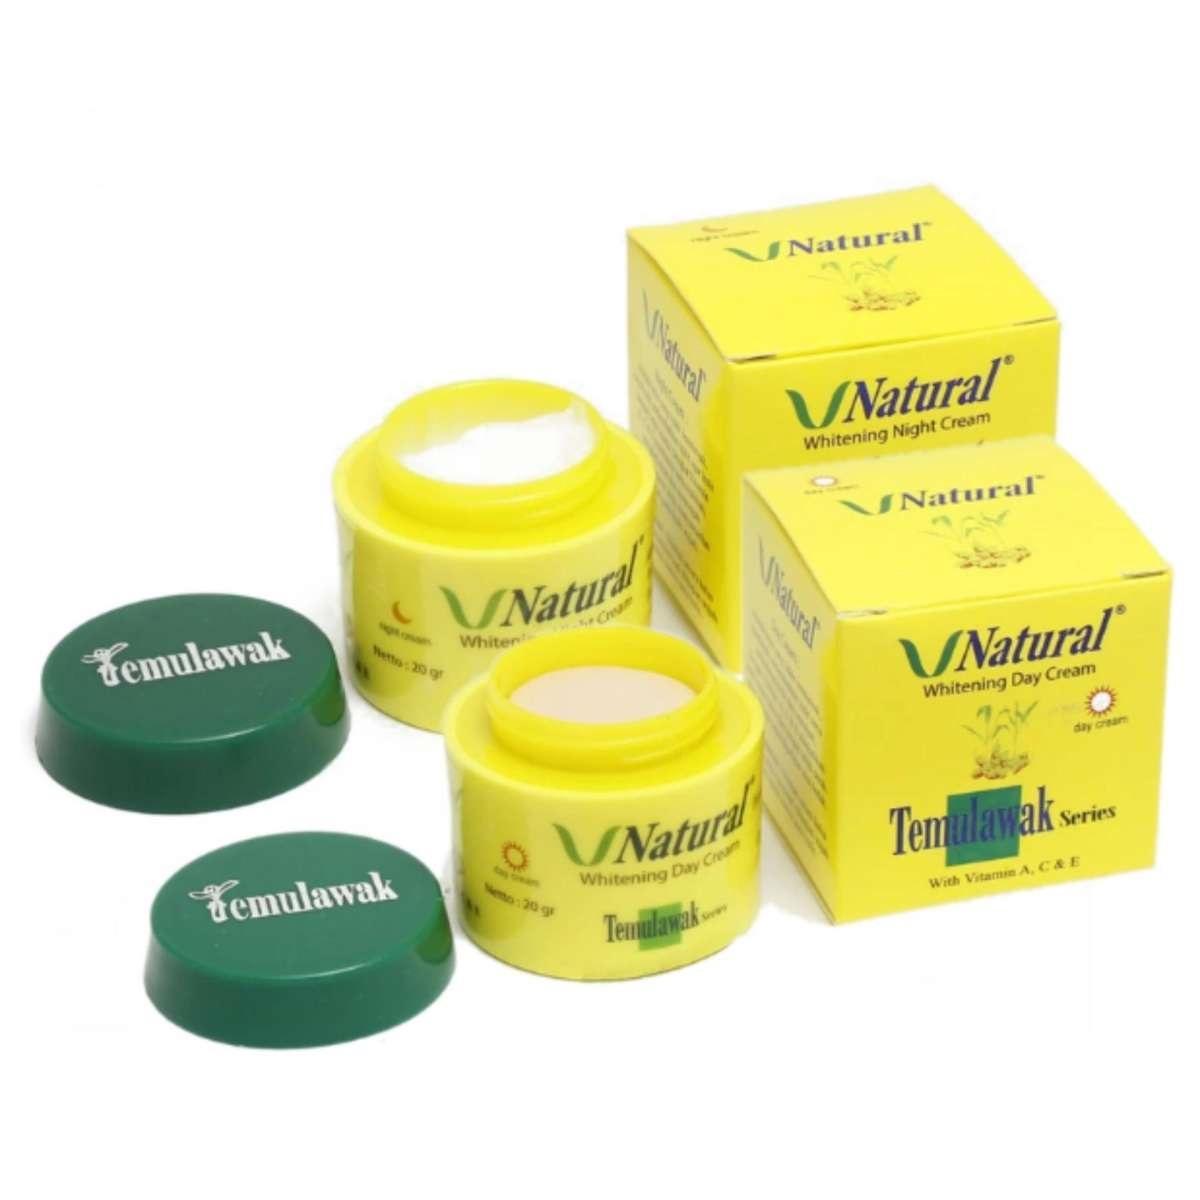 LOKA COD - Paket Cream Temulawak V Natural Original - Cream Siang dan Malam BPOM